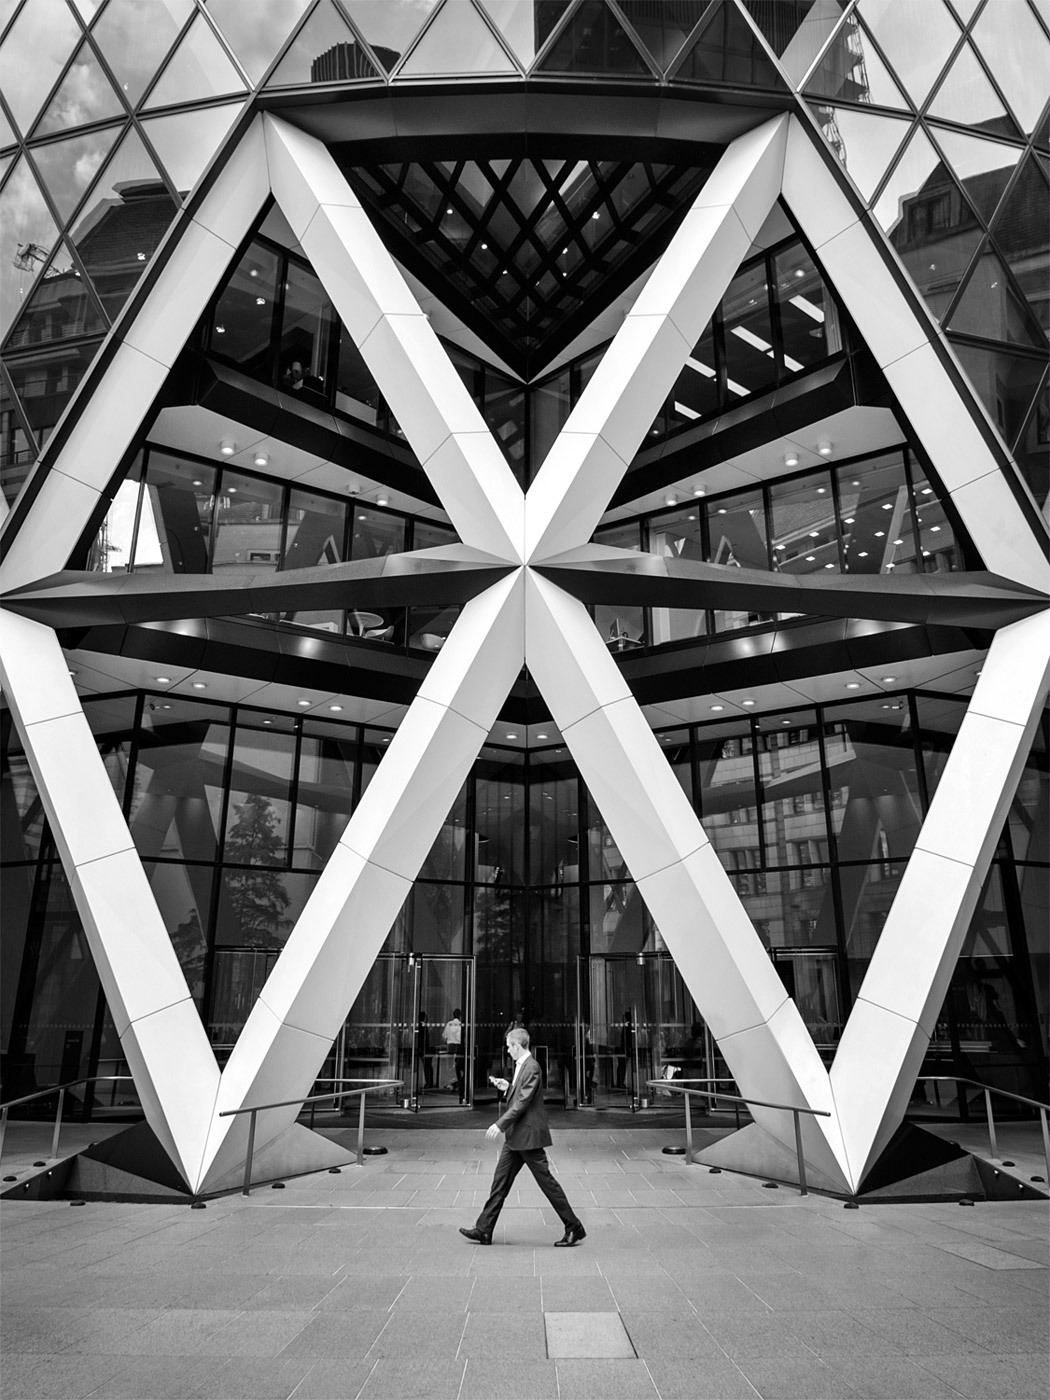 30 St Mary Axe, London. Architect- Norman Foster. © Edward Neumann : EMCN